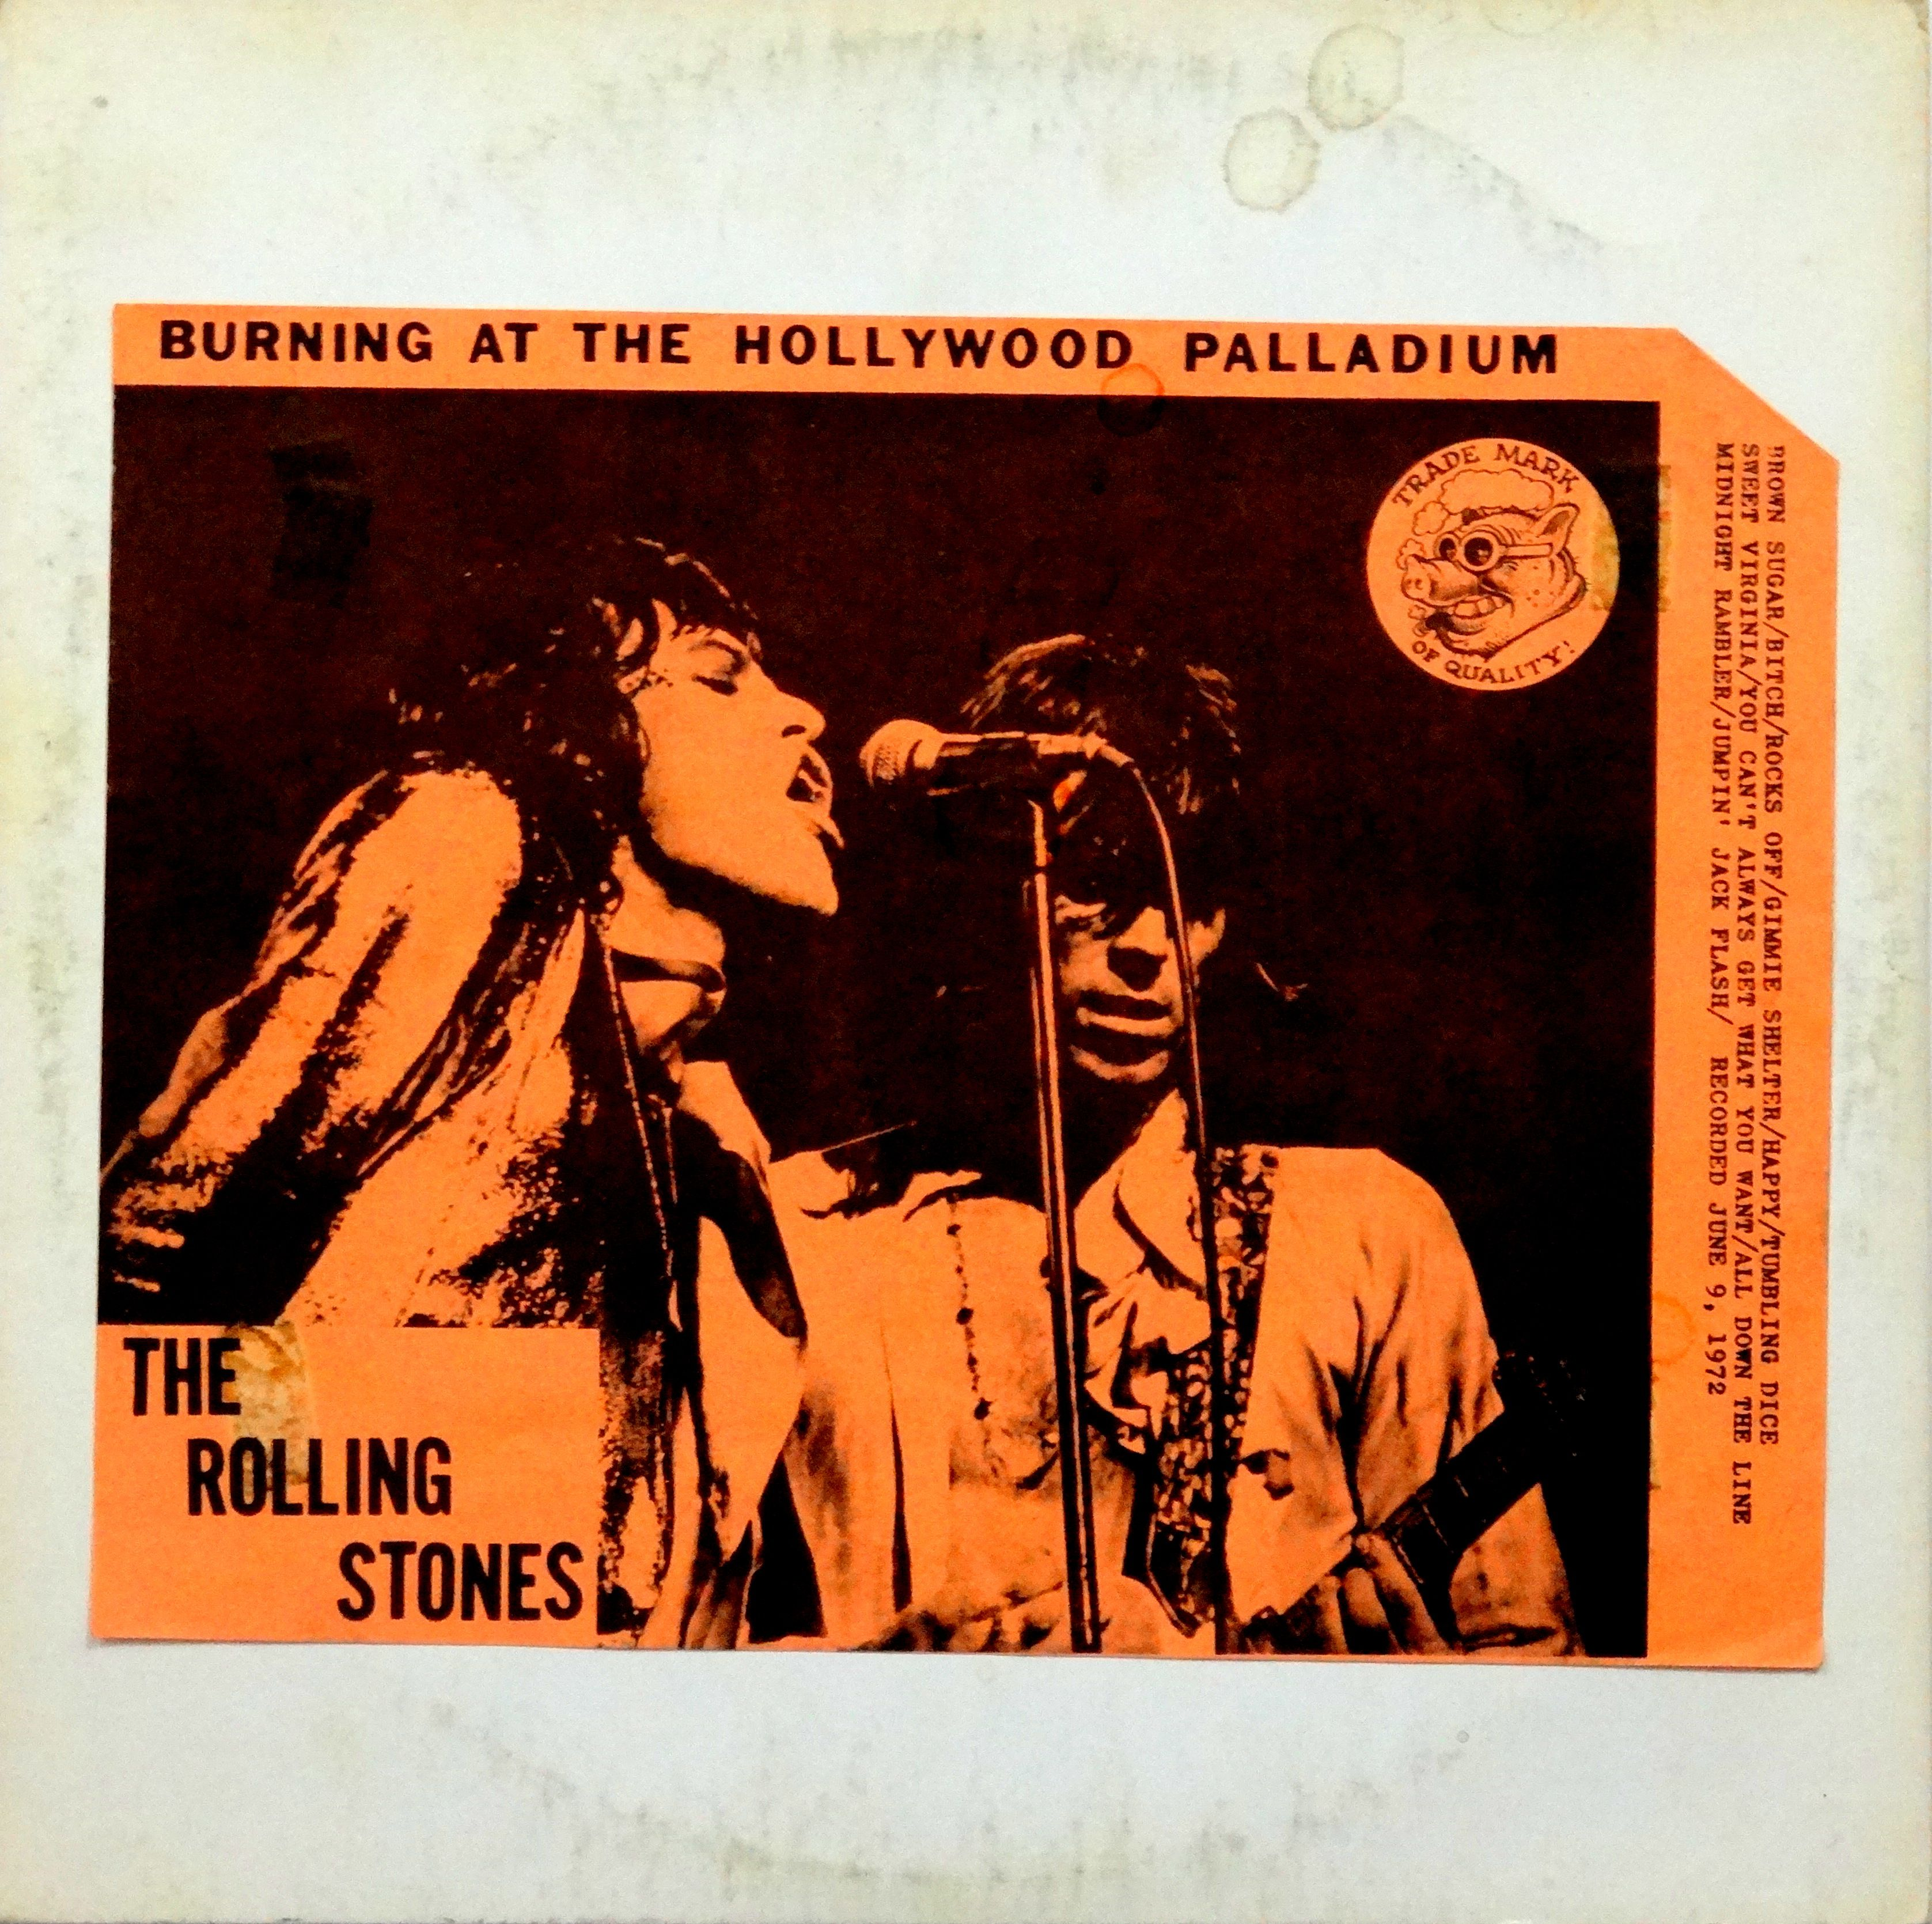 TMOQ: The Rolling Stones 'Burning at the Hollywood Palladium' 9 June 1972, good mono recording